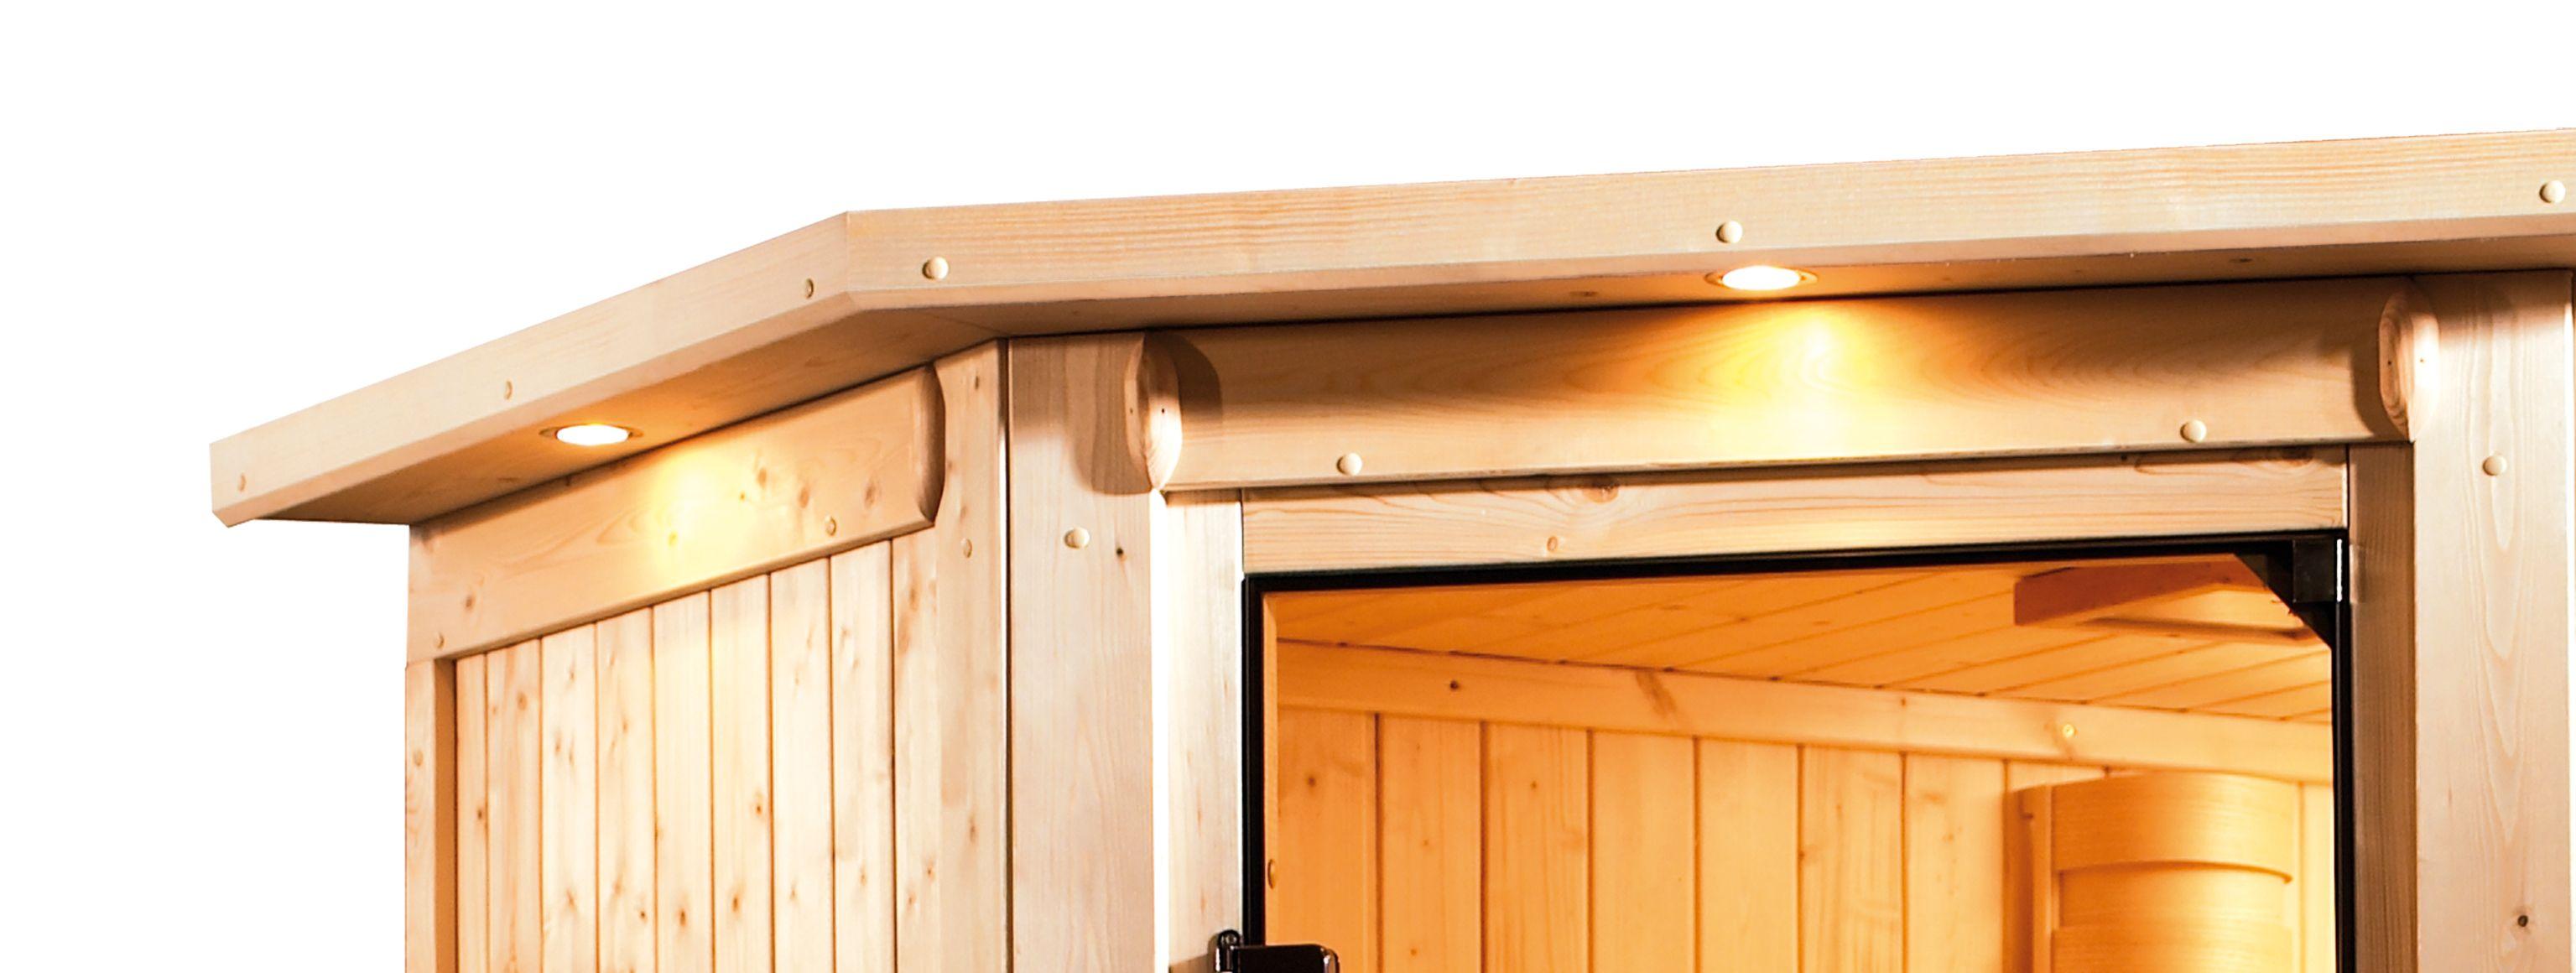 Woodfeeling Sauna Lotta 38mm Dachkranz Bio Saunaofen 9 kW extern Bild 9